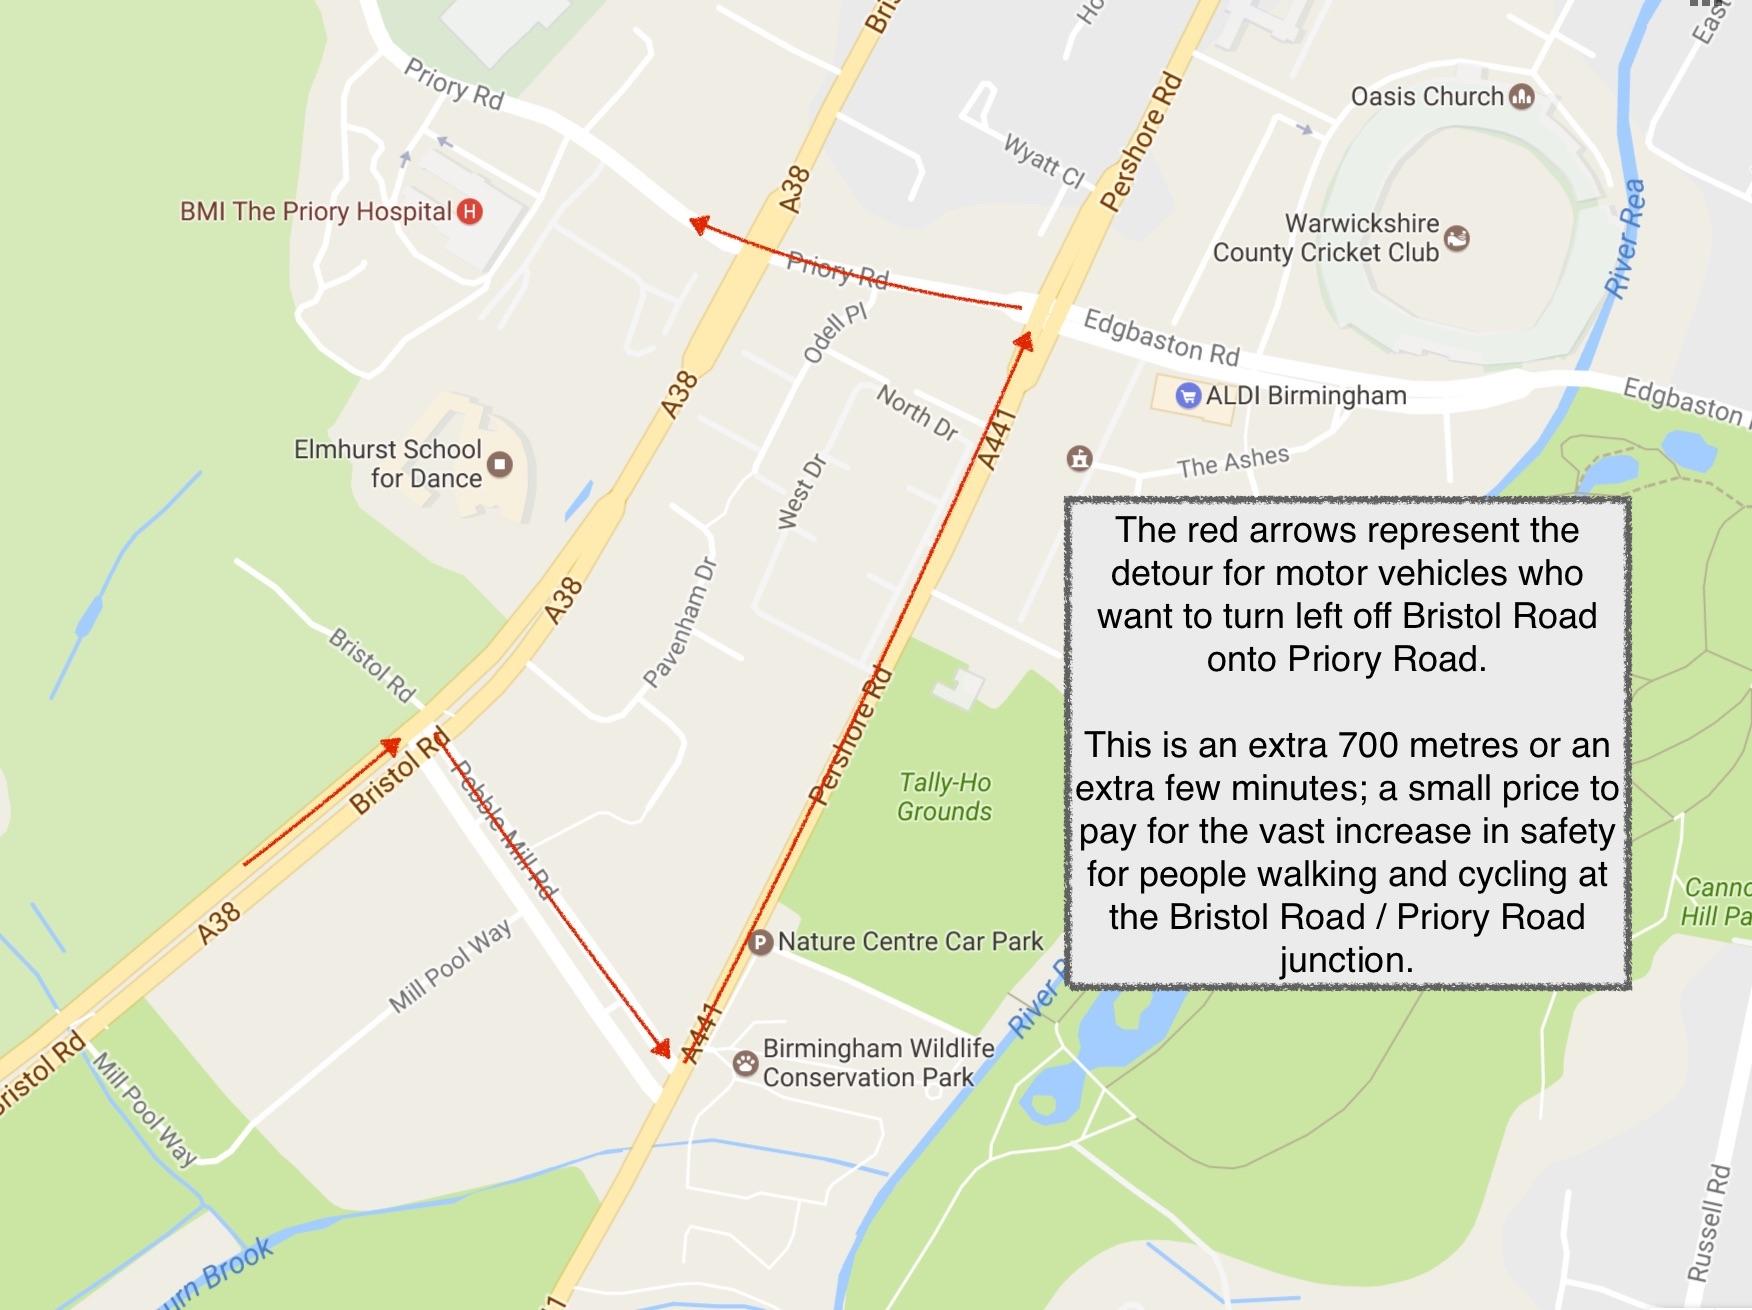 Bristol Road around the Priory Road junction